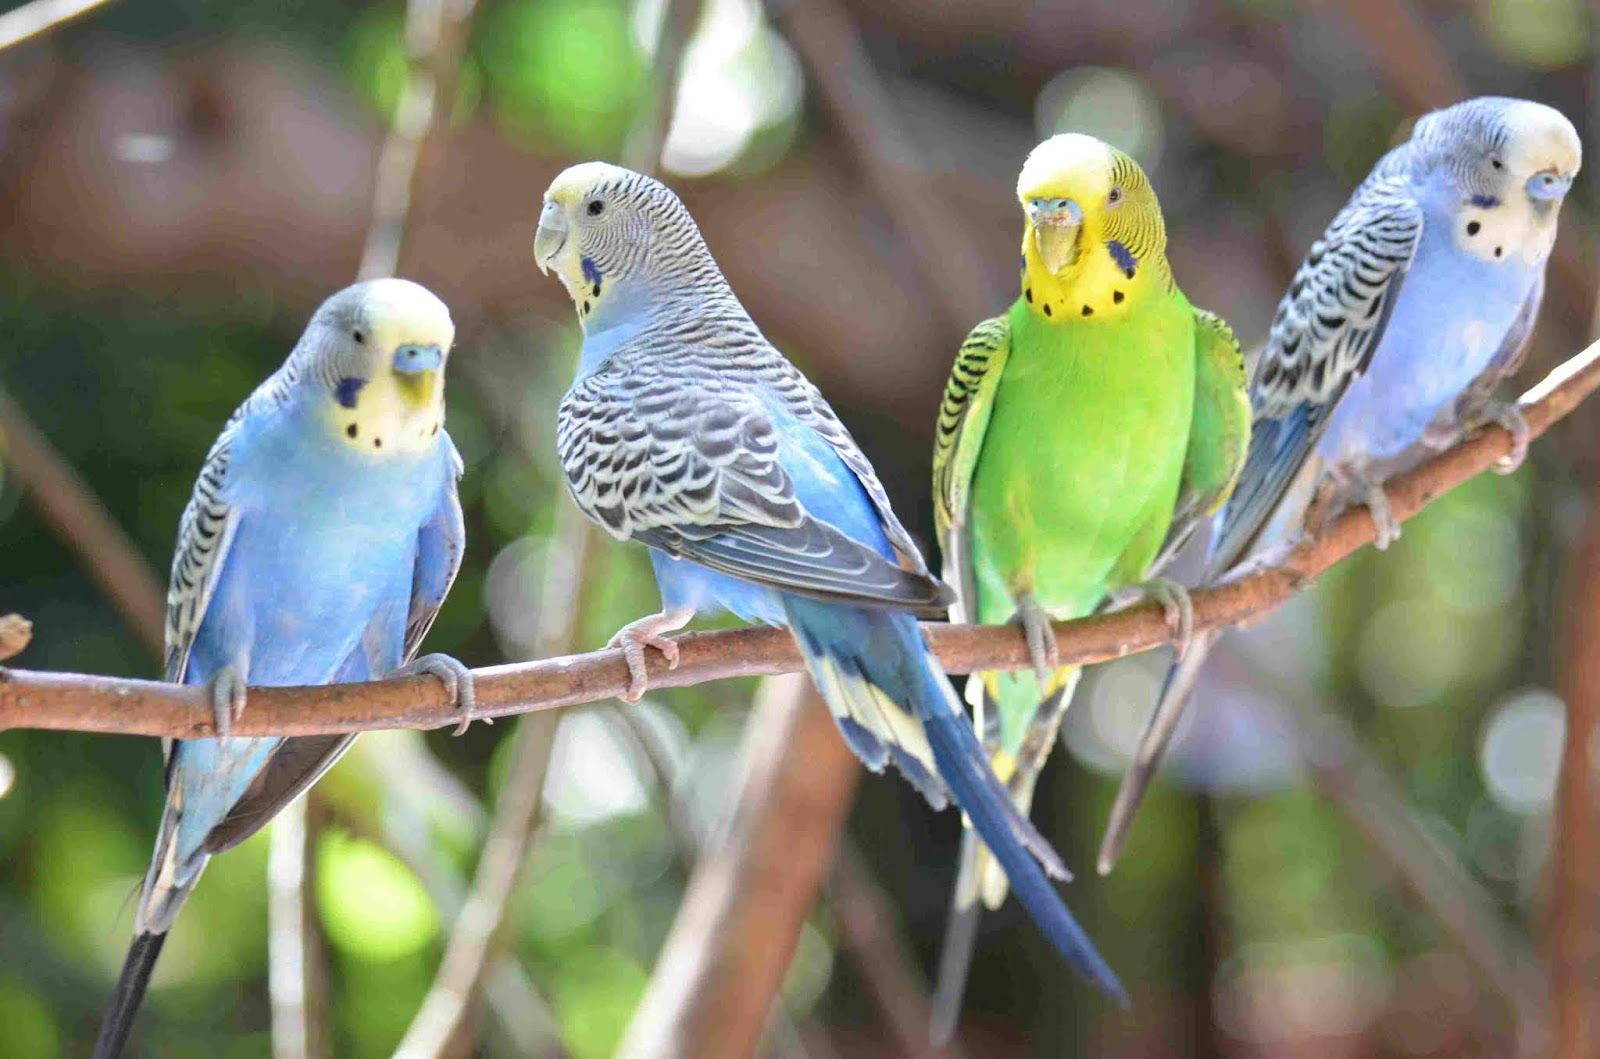 Perilaku Agresif pada burung Budgies